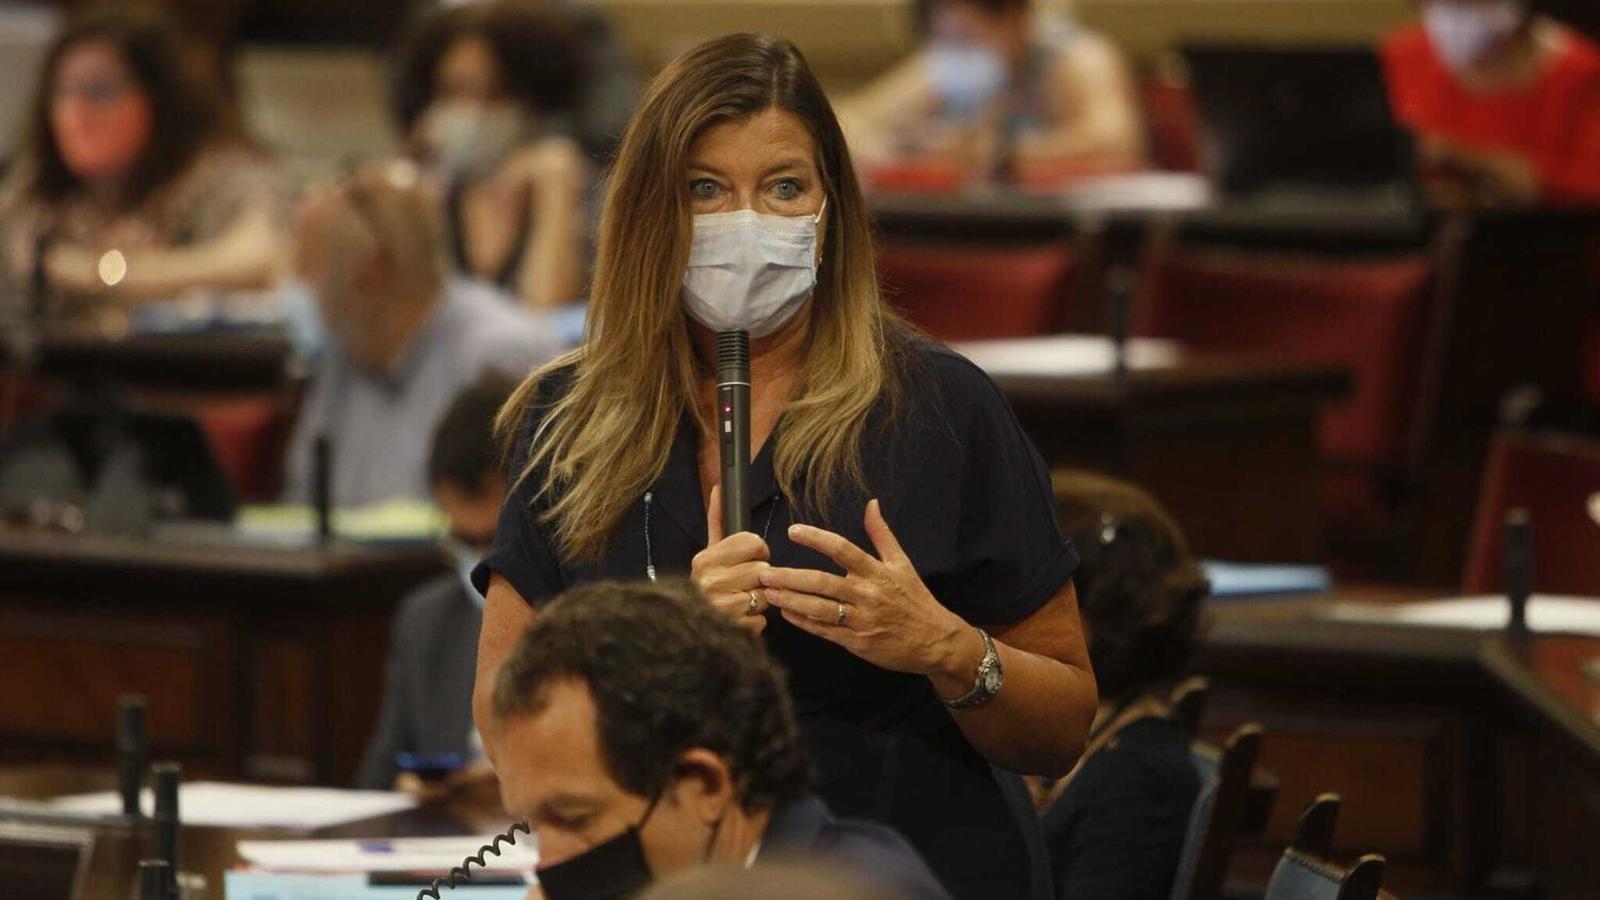 La consellera de Salut, Patricia Gómez, al Parlament balear.